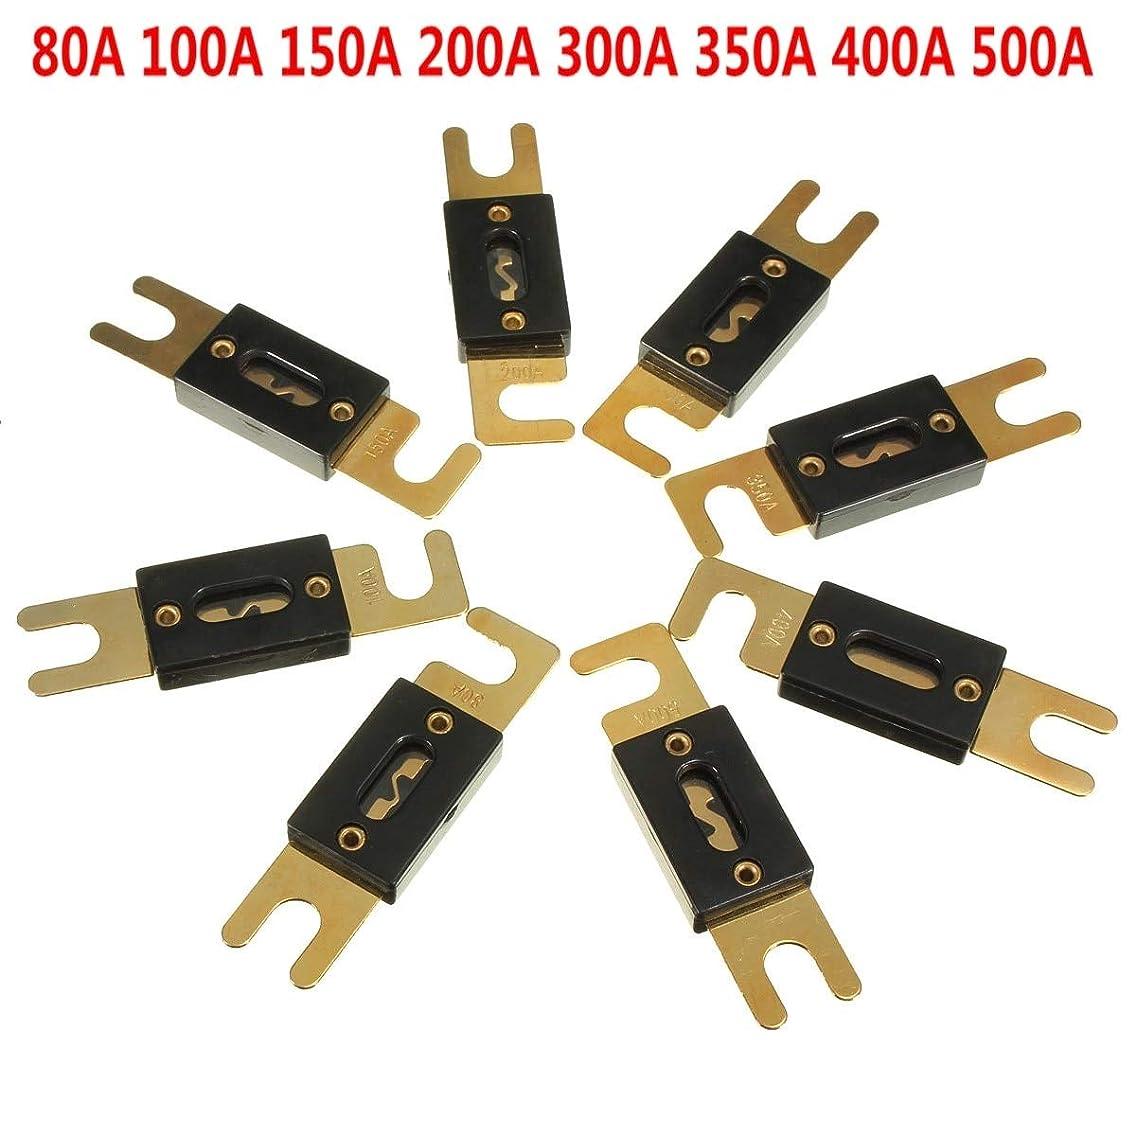 Car Audio Stero ANL Fuse Holder 100A 150A 200A 300A 400A 500A AMP Gold